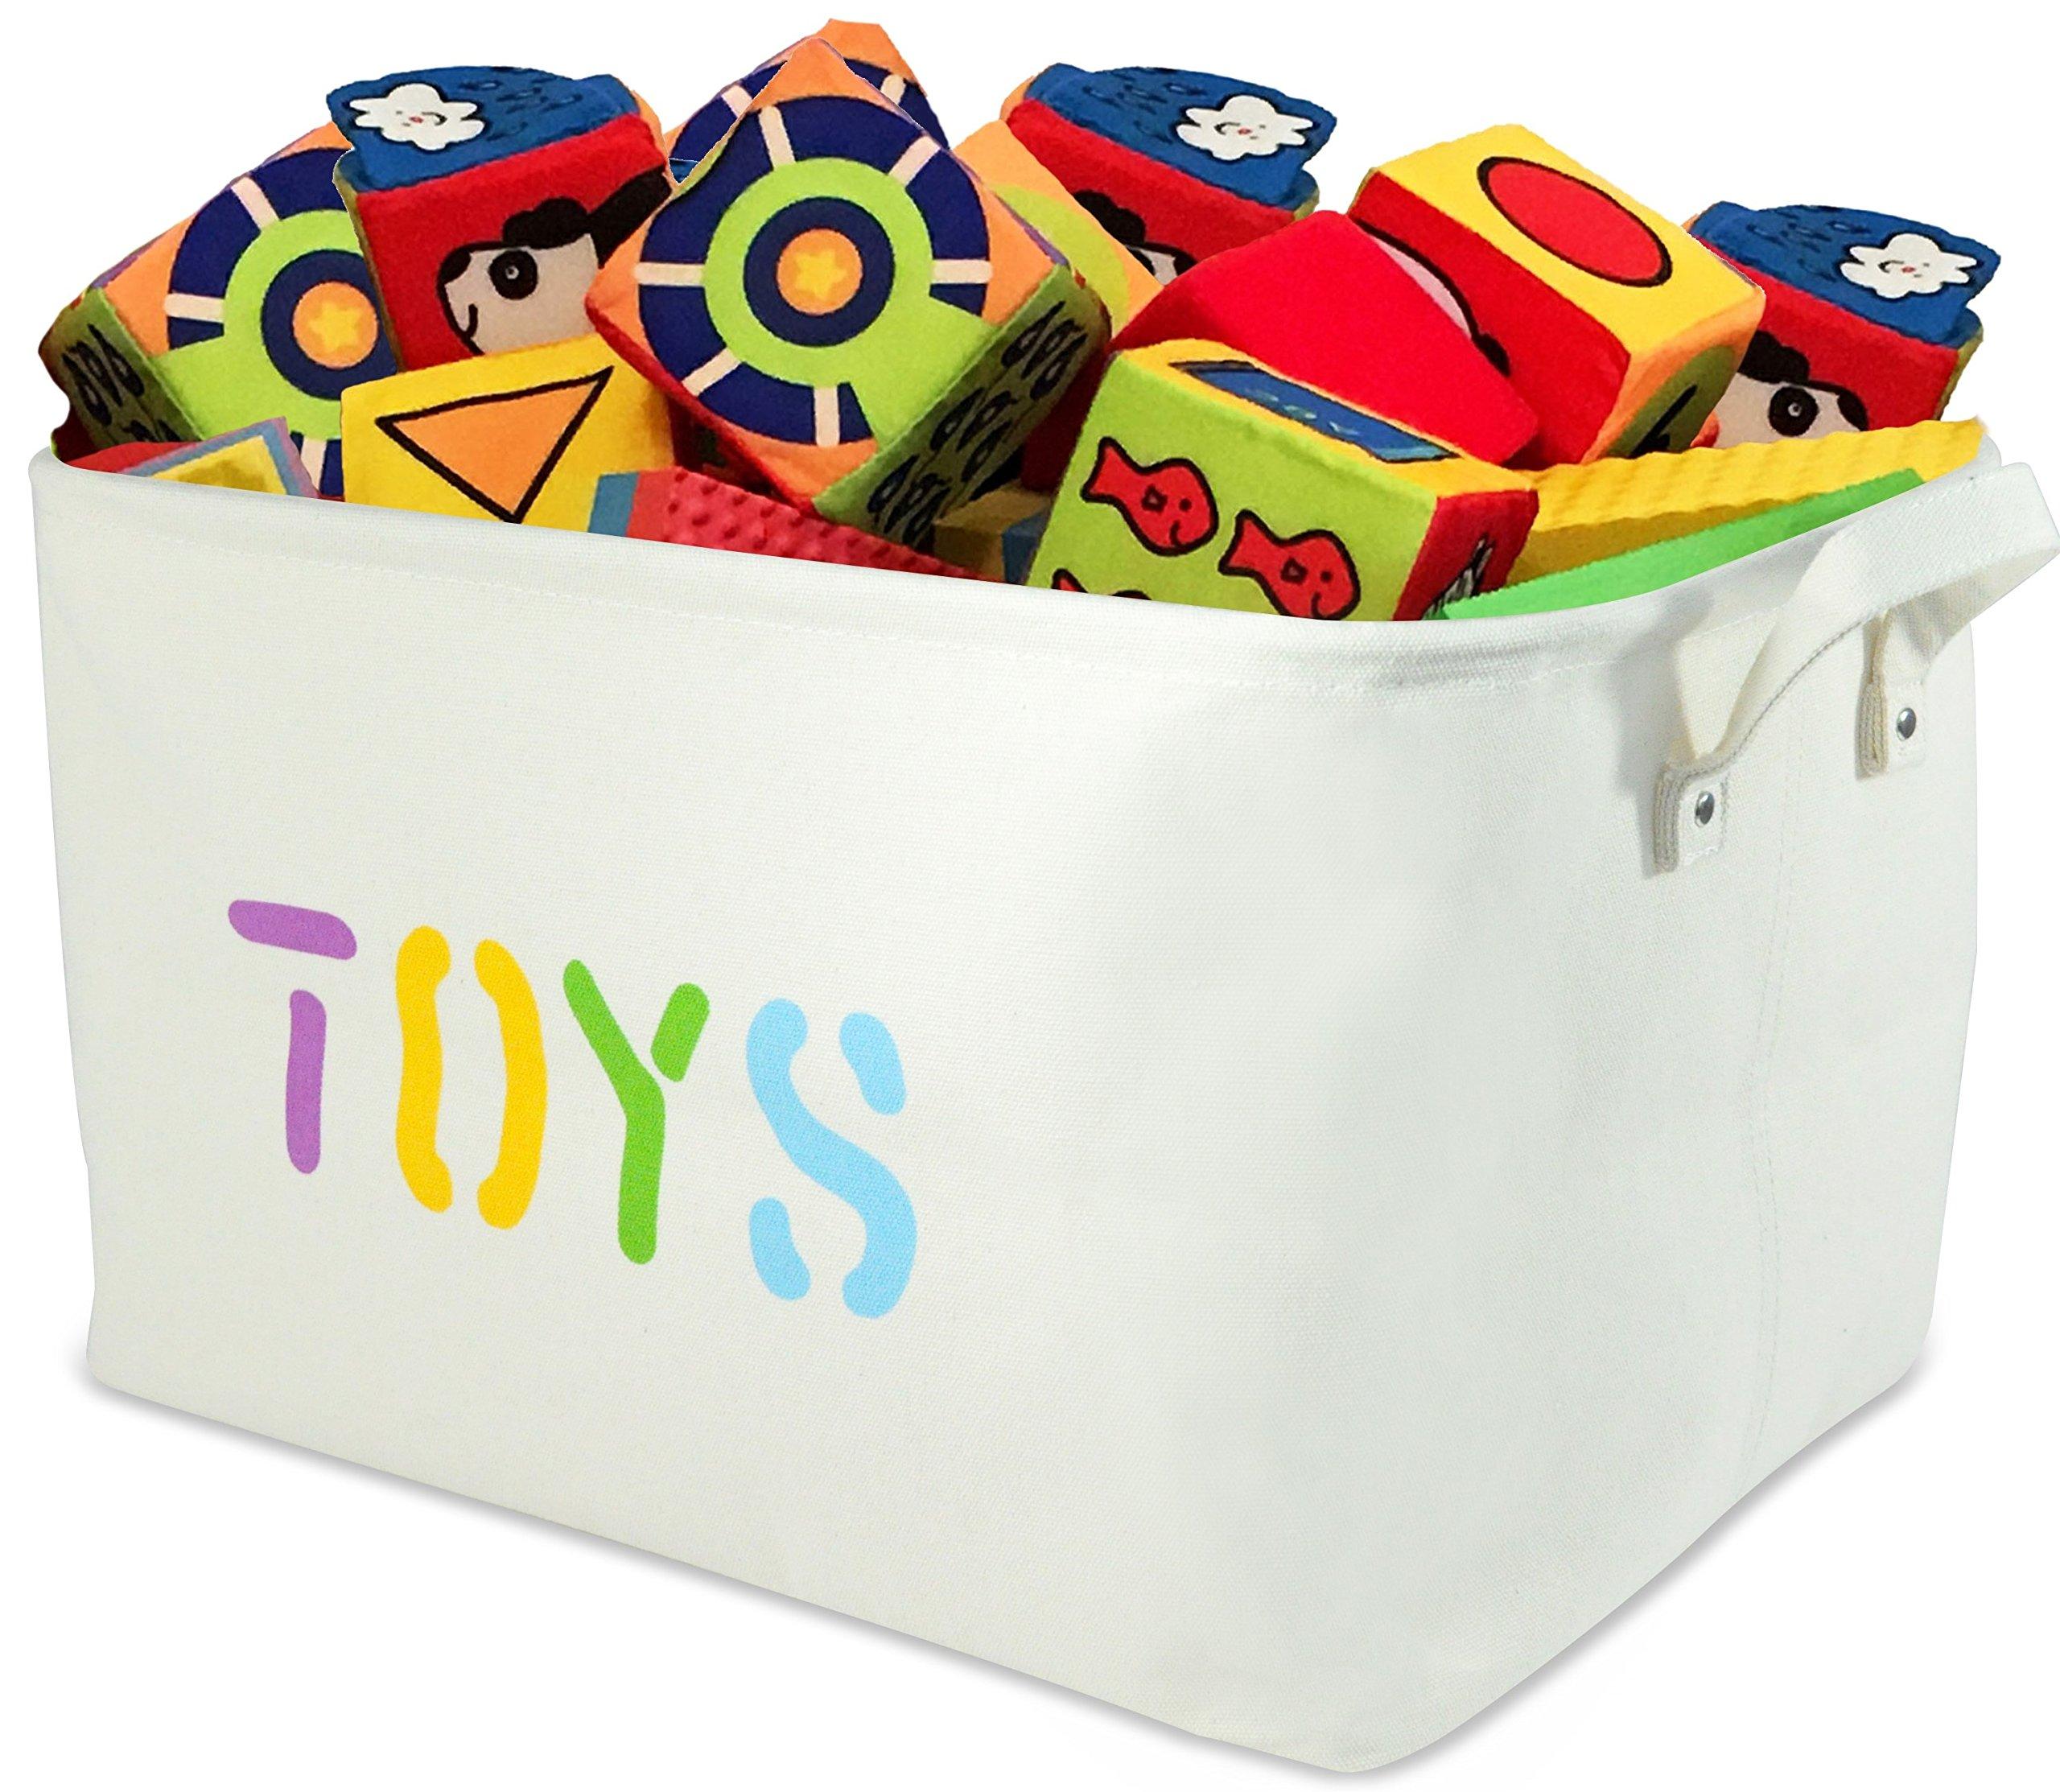 "OrganizerLogic Canvas Storage Basket - Large Storage Bin with Handles - Decorative Storage Containers in Beige - 22"" x 15"" x 13"" Woven Fabric Bin (Extra Large)"